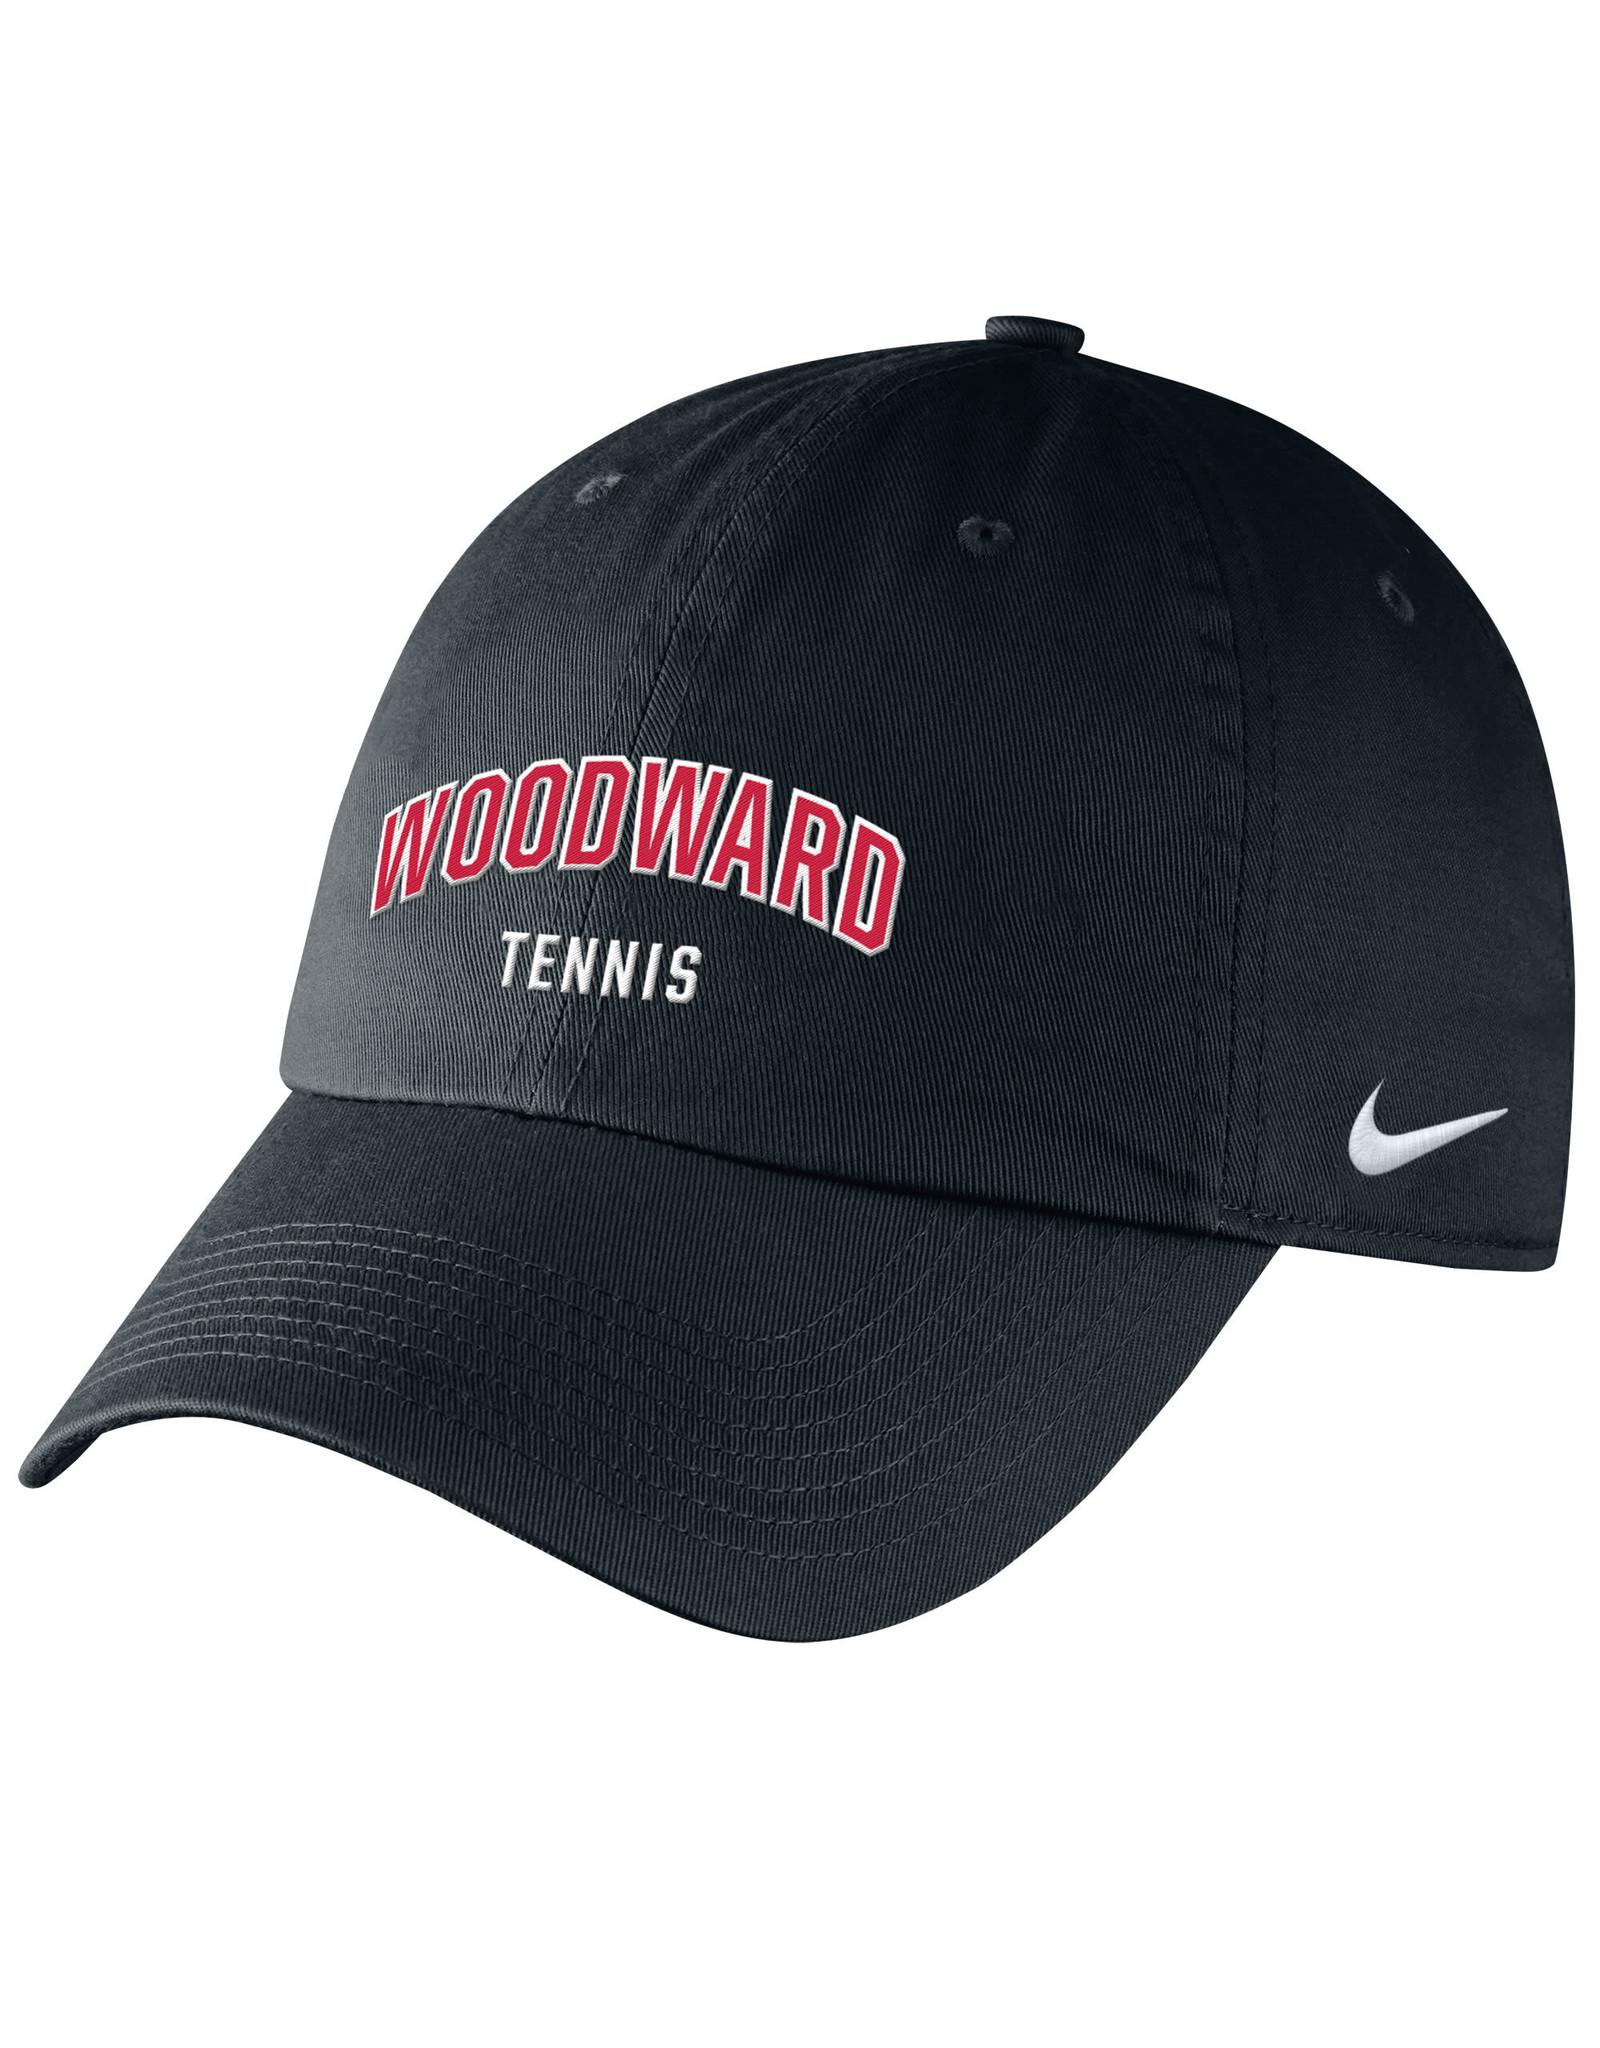 NIKE CAP Campus Sport Tennis by NIKE